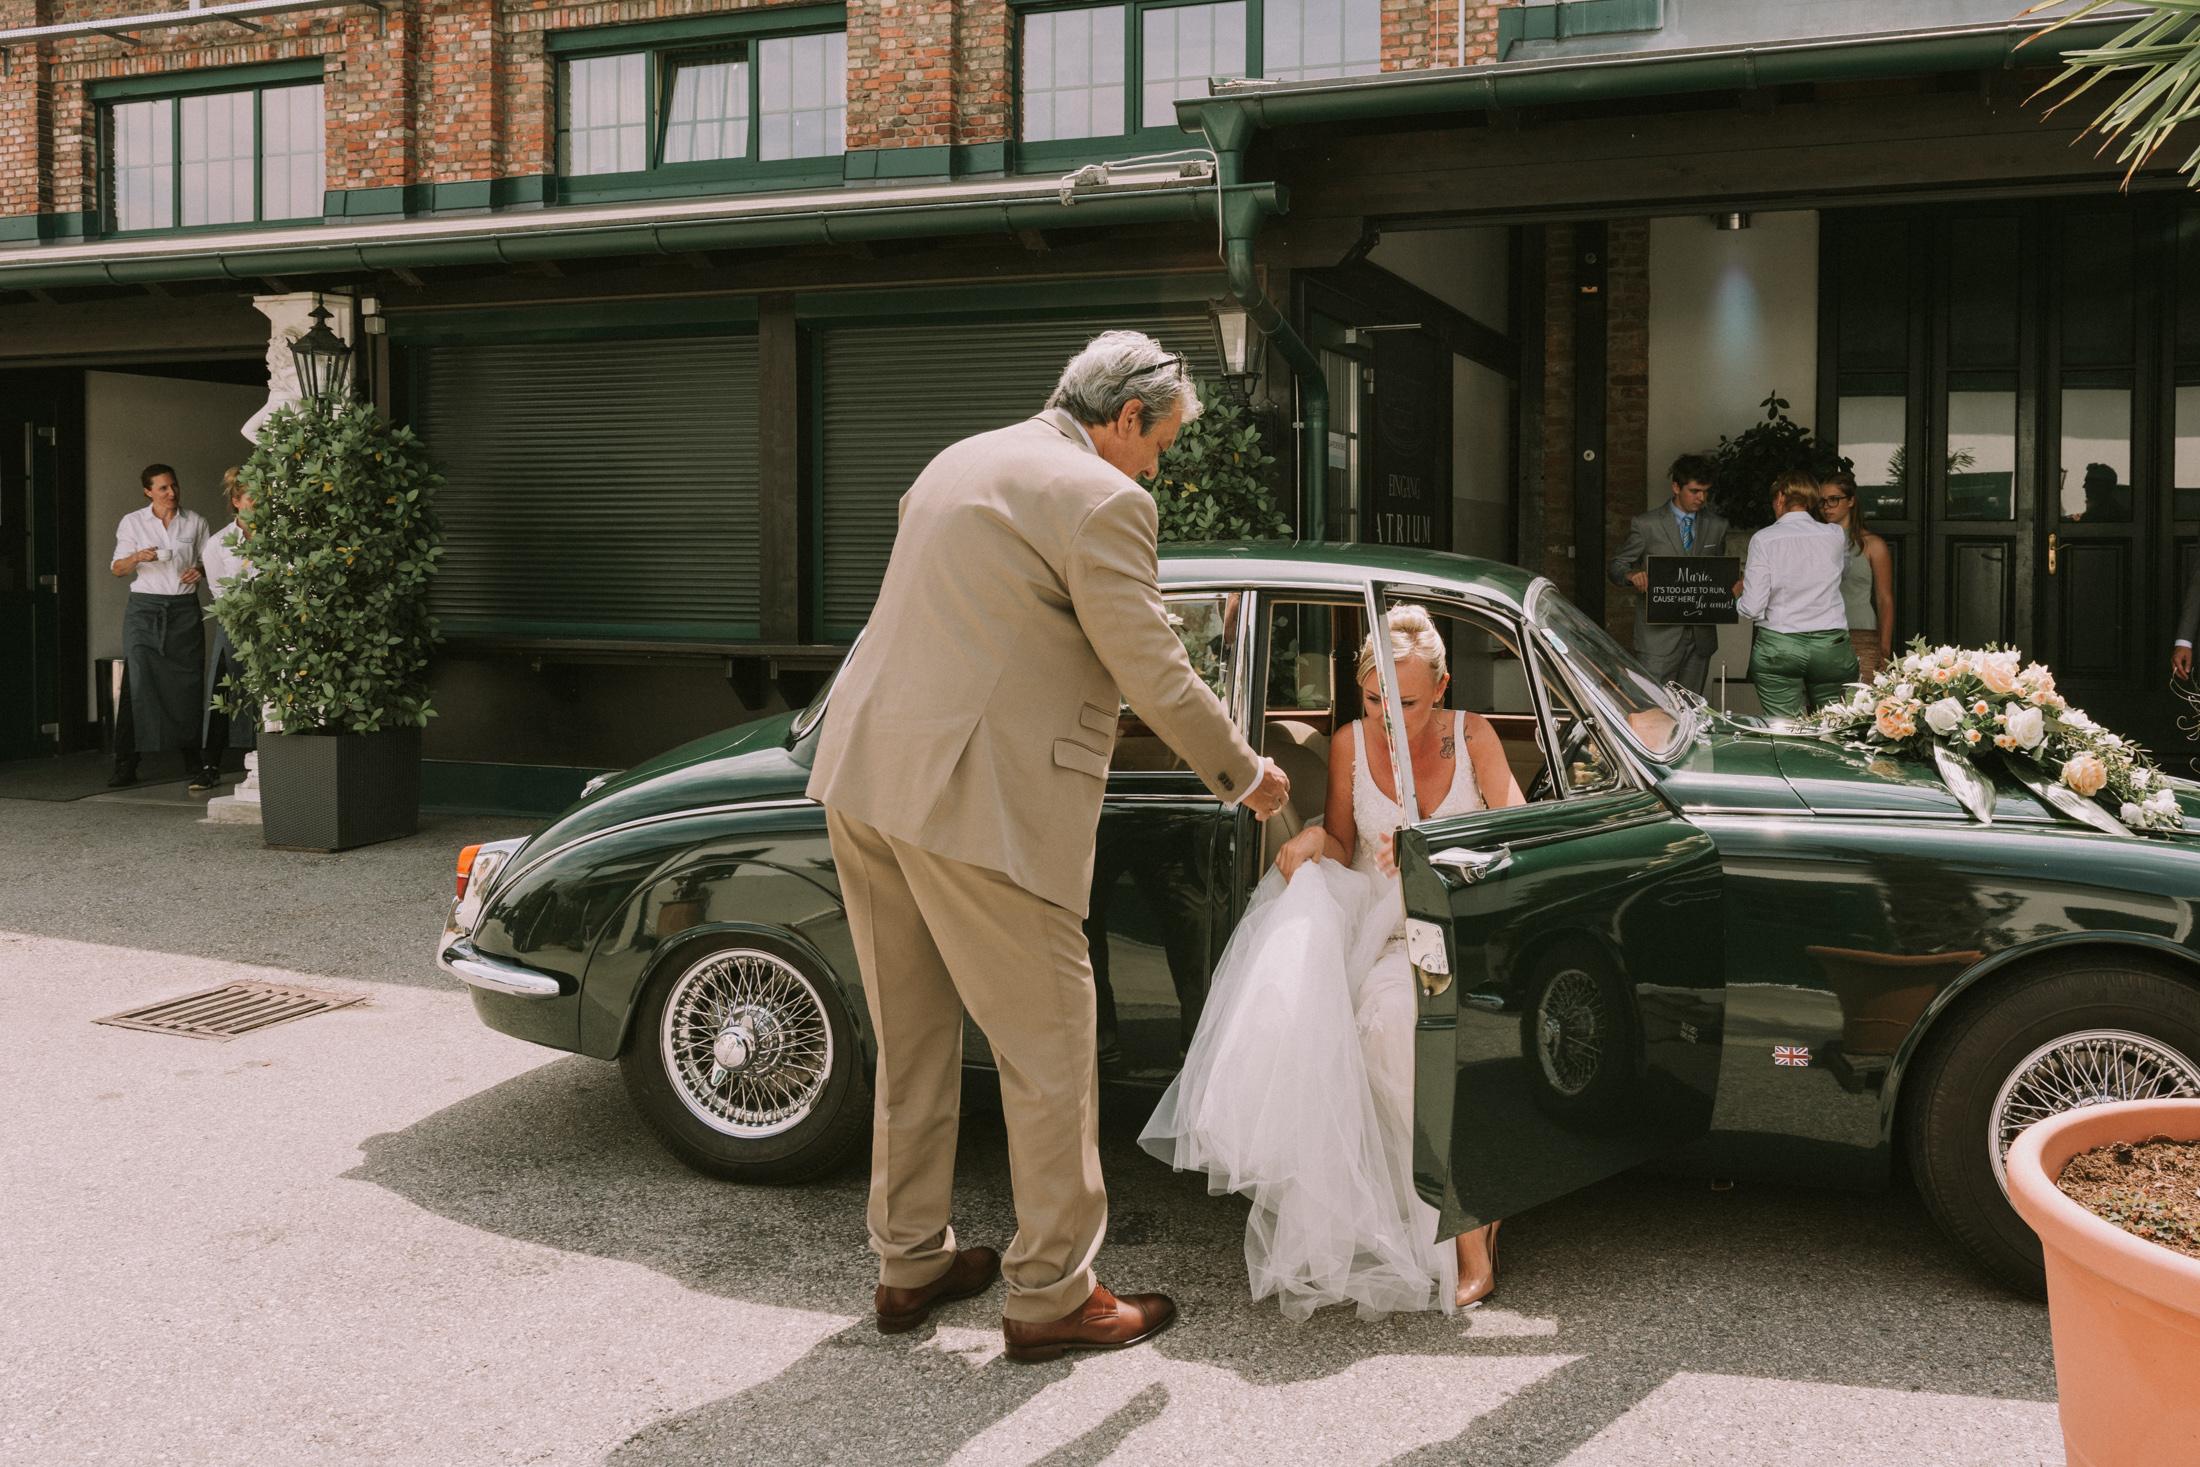 SebastianDon-Hochzeitsfotograf-Wien Umgebung-7103489.jpg